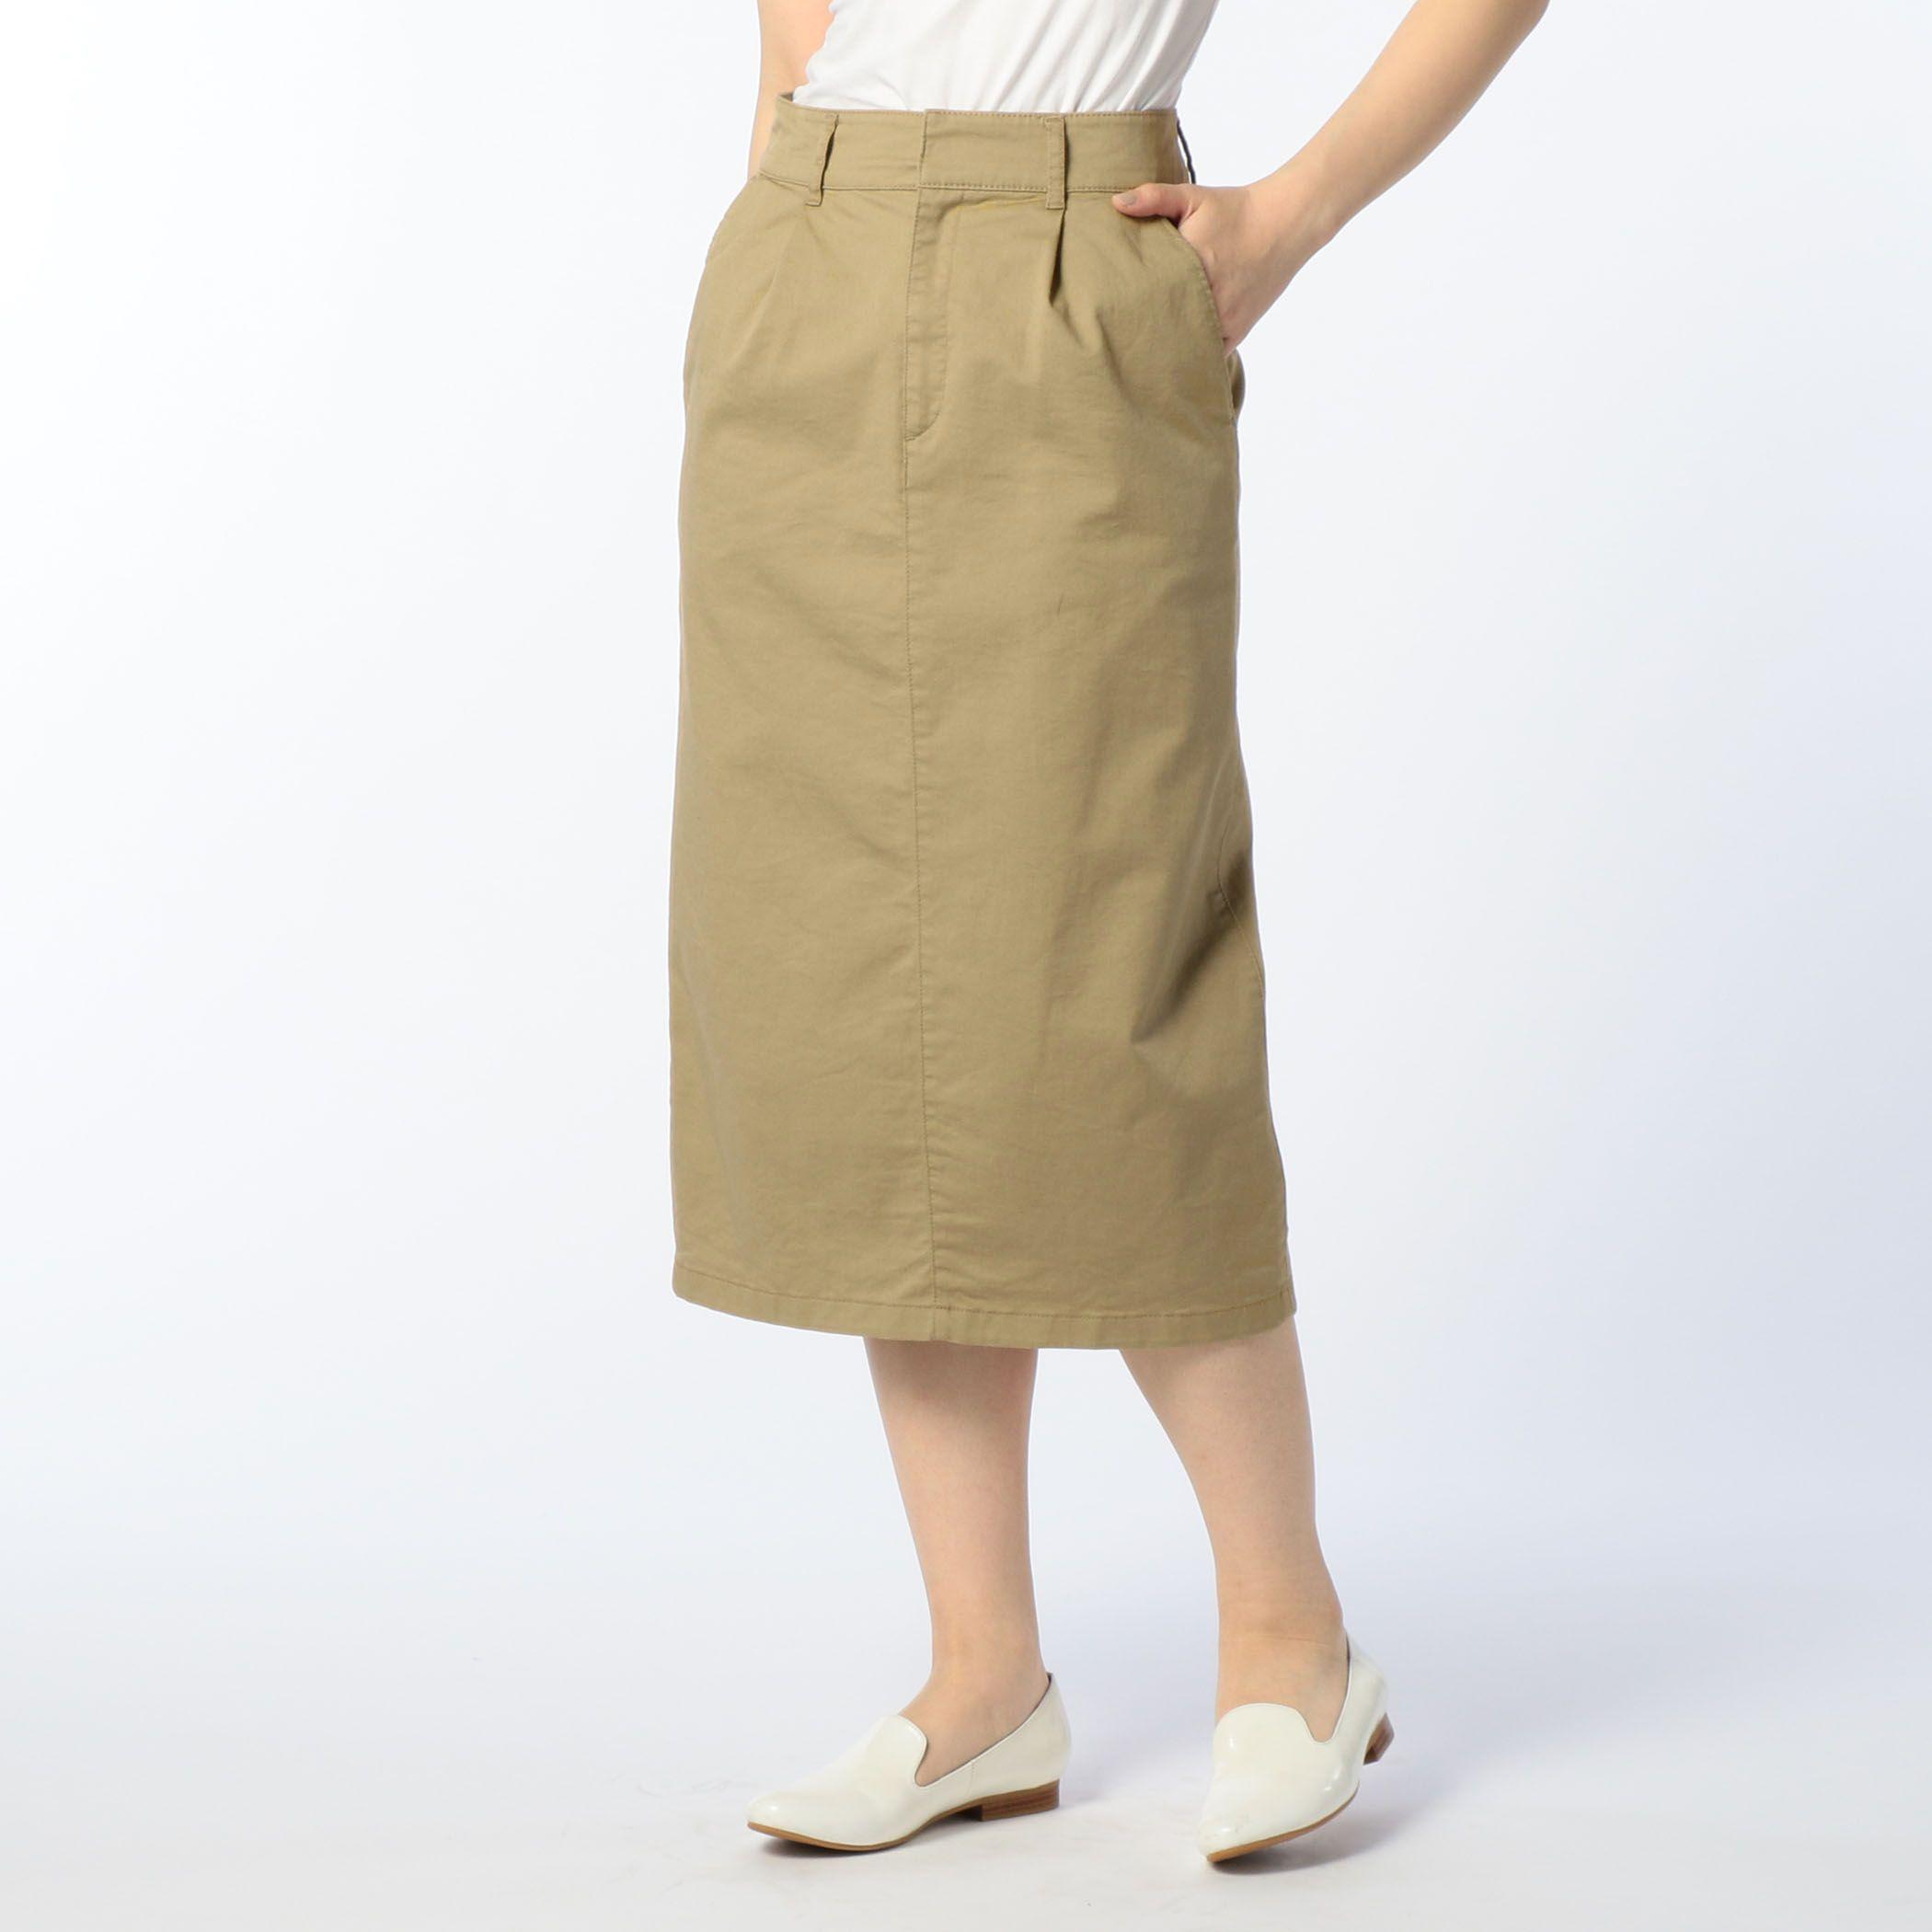 NOLLEY'Sノーリーズ/チノストレッチタイトスカート